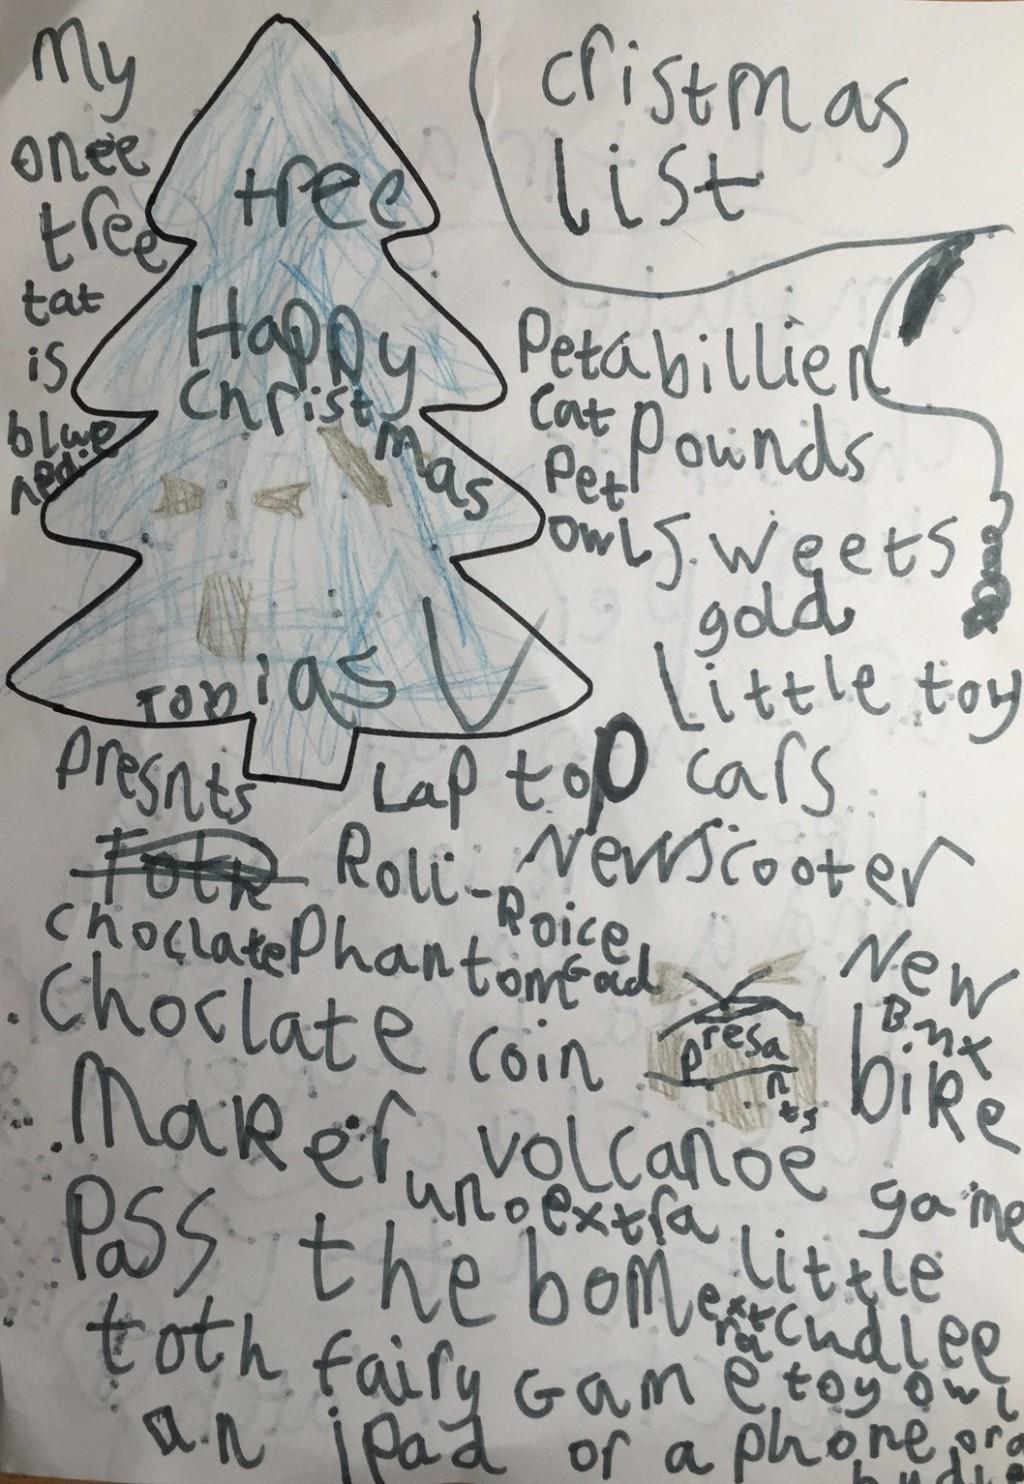 Toby's Christmas list